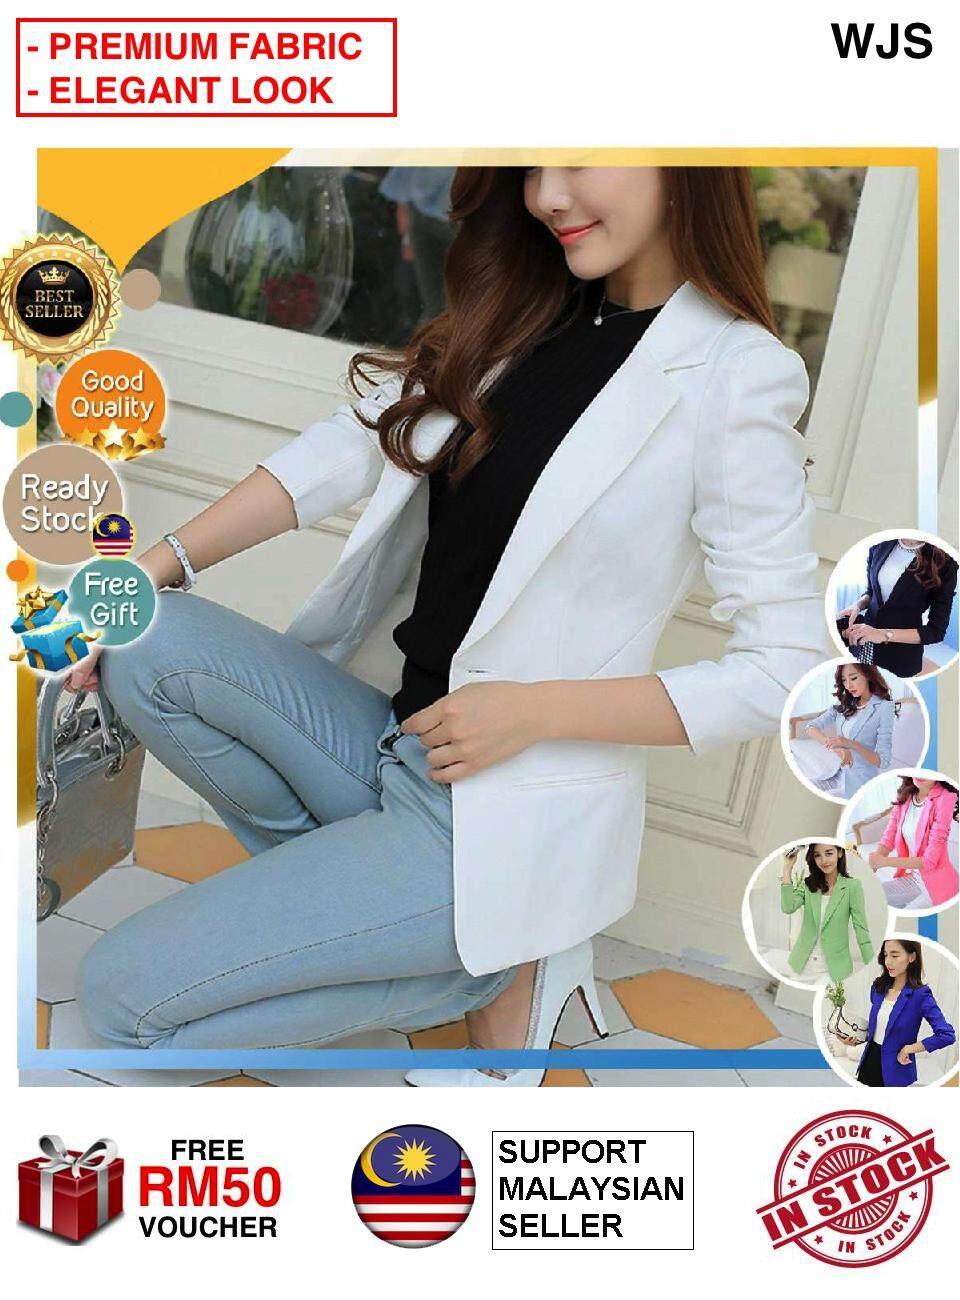 (PREMIUM FABRIC) WJS 2020 Women's Slim Fit Coat Stylish One Button Suit Coat Jacket Business Formal Smart Blazer High Quality OL Office Blazer MULTICOLOR [FREE RM 50 VOUCHER]